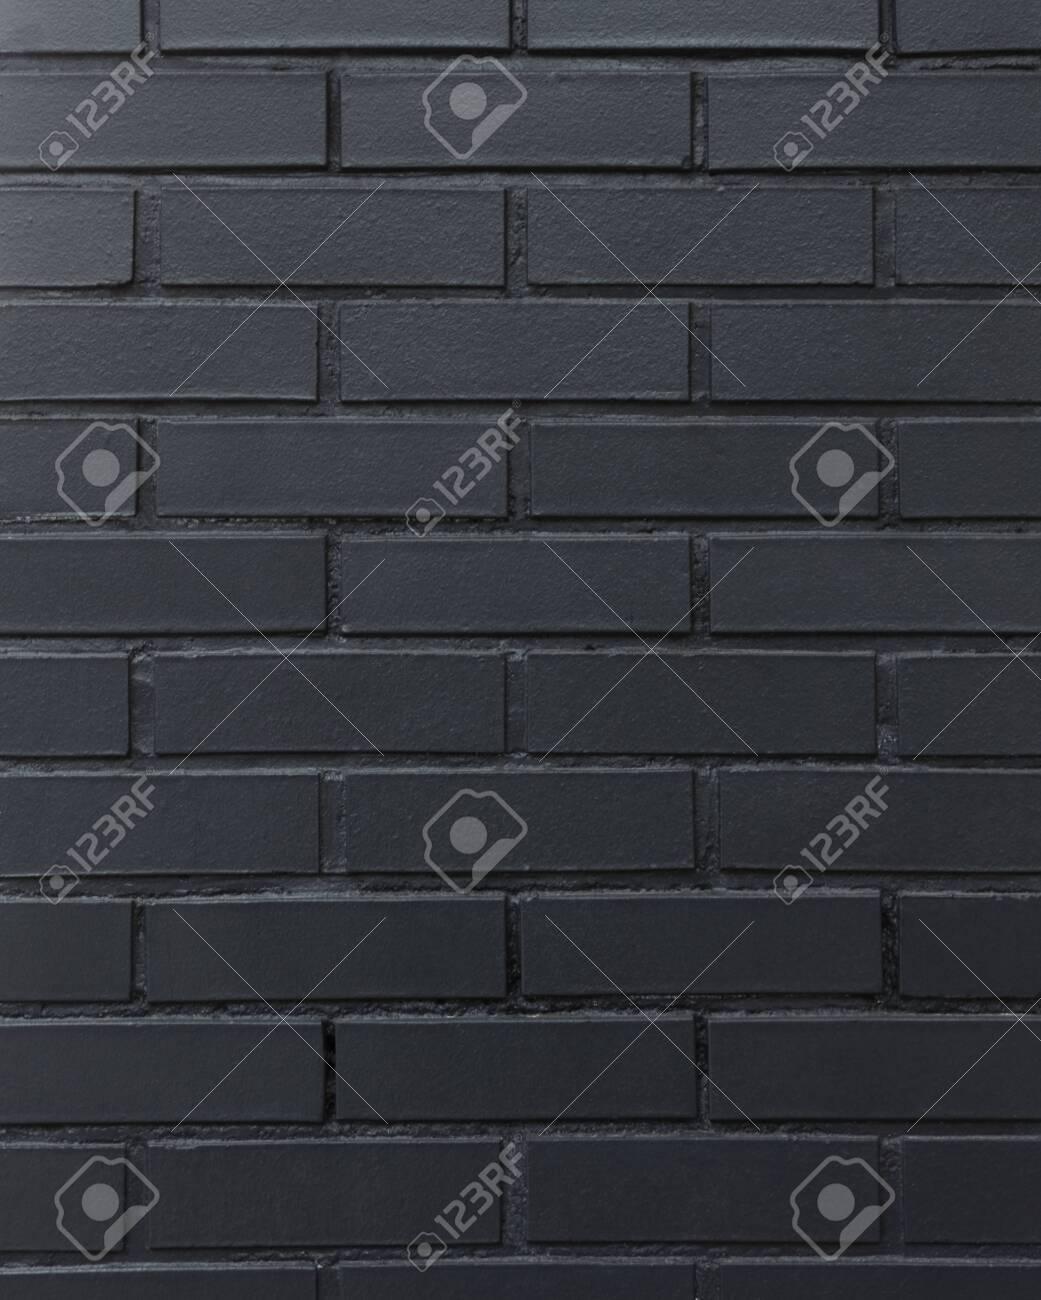 black brick wall background - 129195448